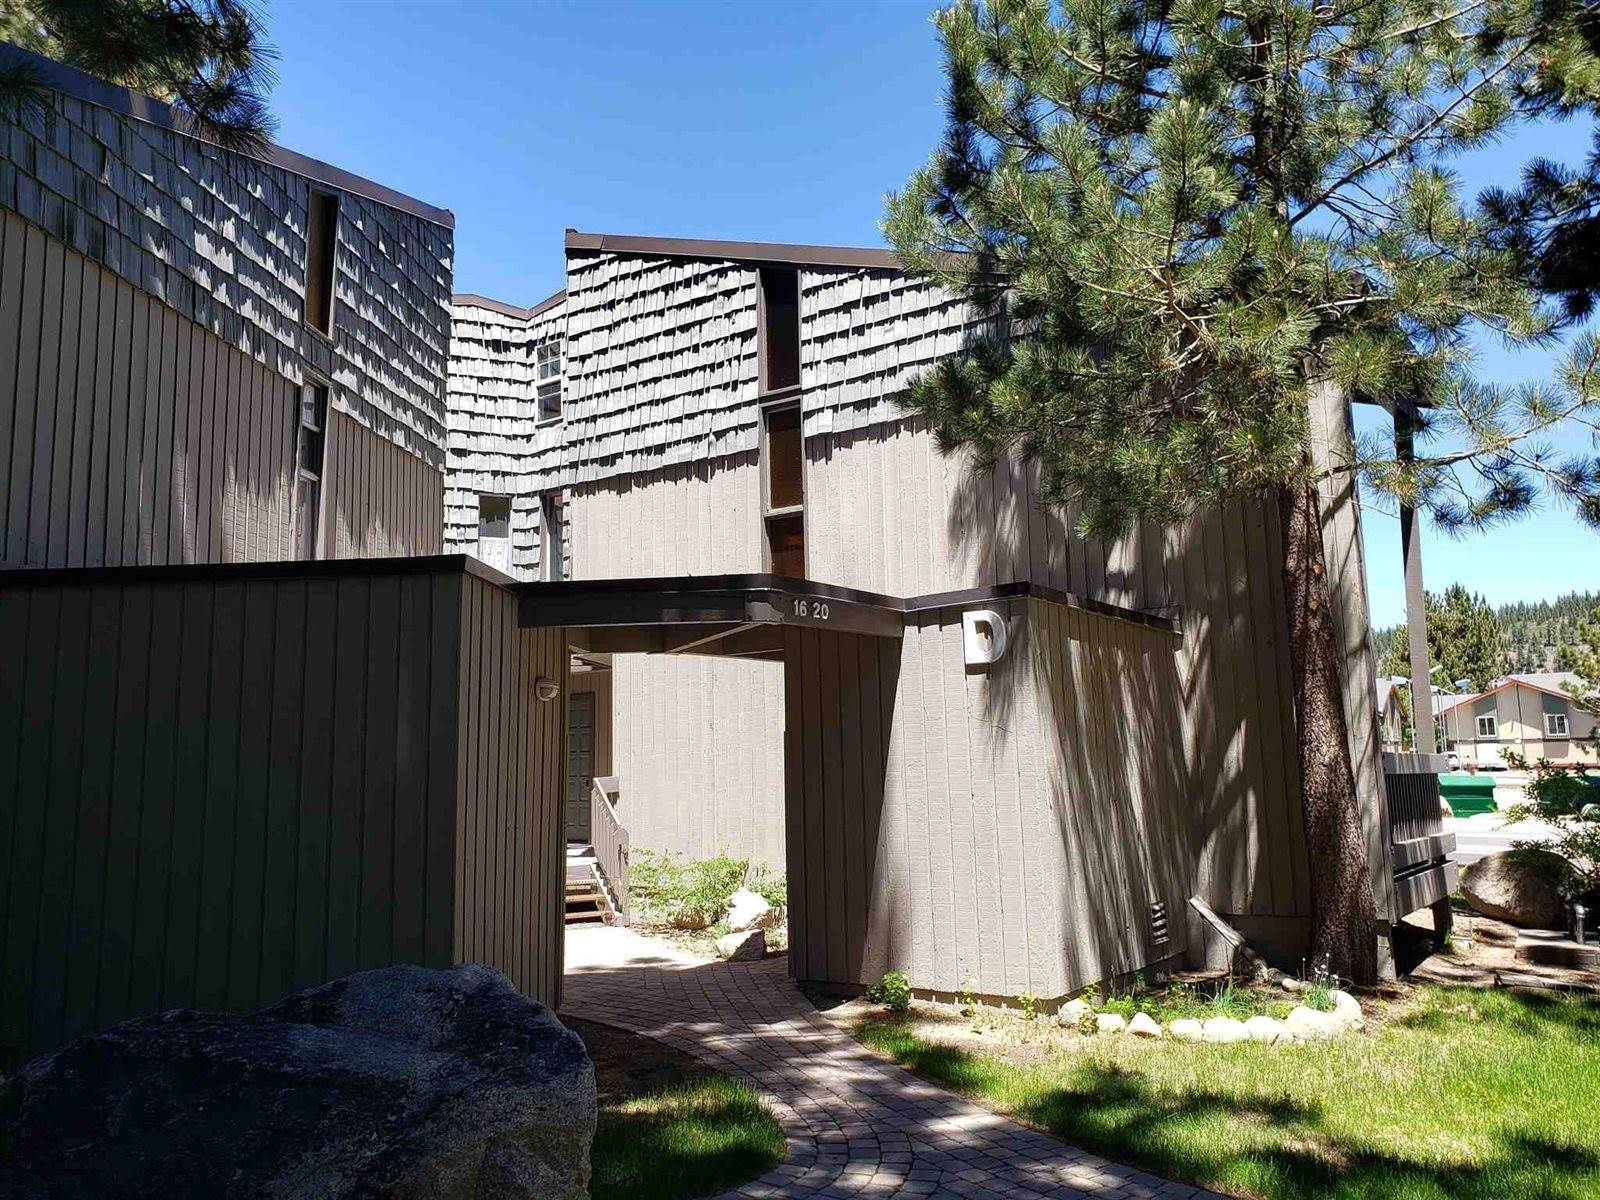 286 Old Mammoth Road #17, Sierra Park Villas #17, Mammoth Lakes, CA 93546